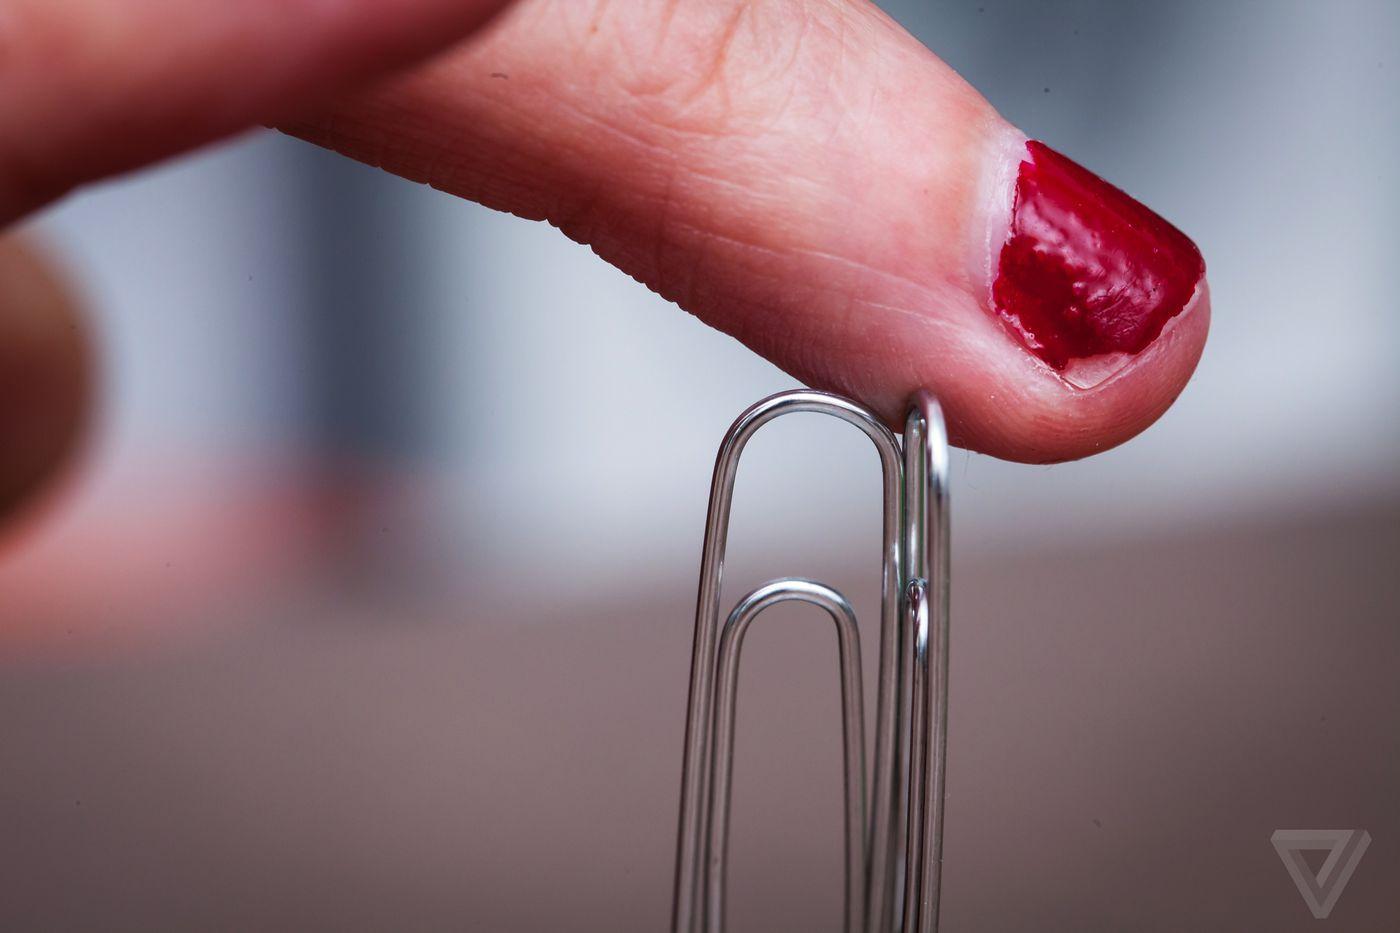 Magnetic Implants